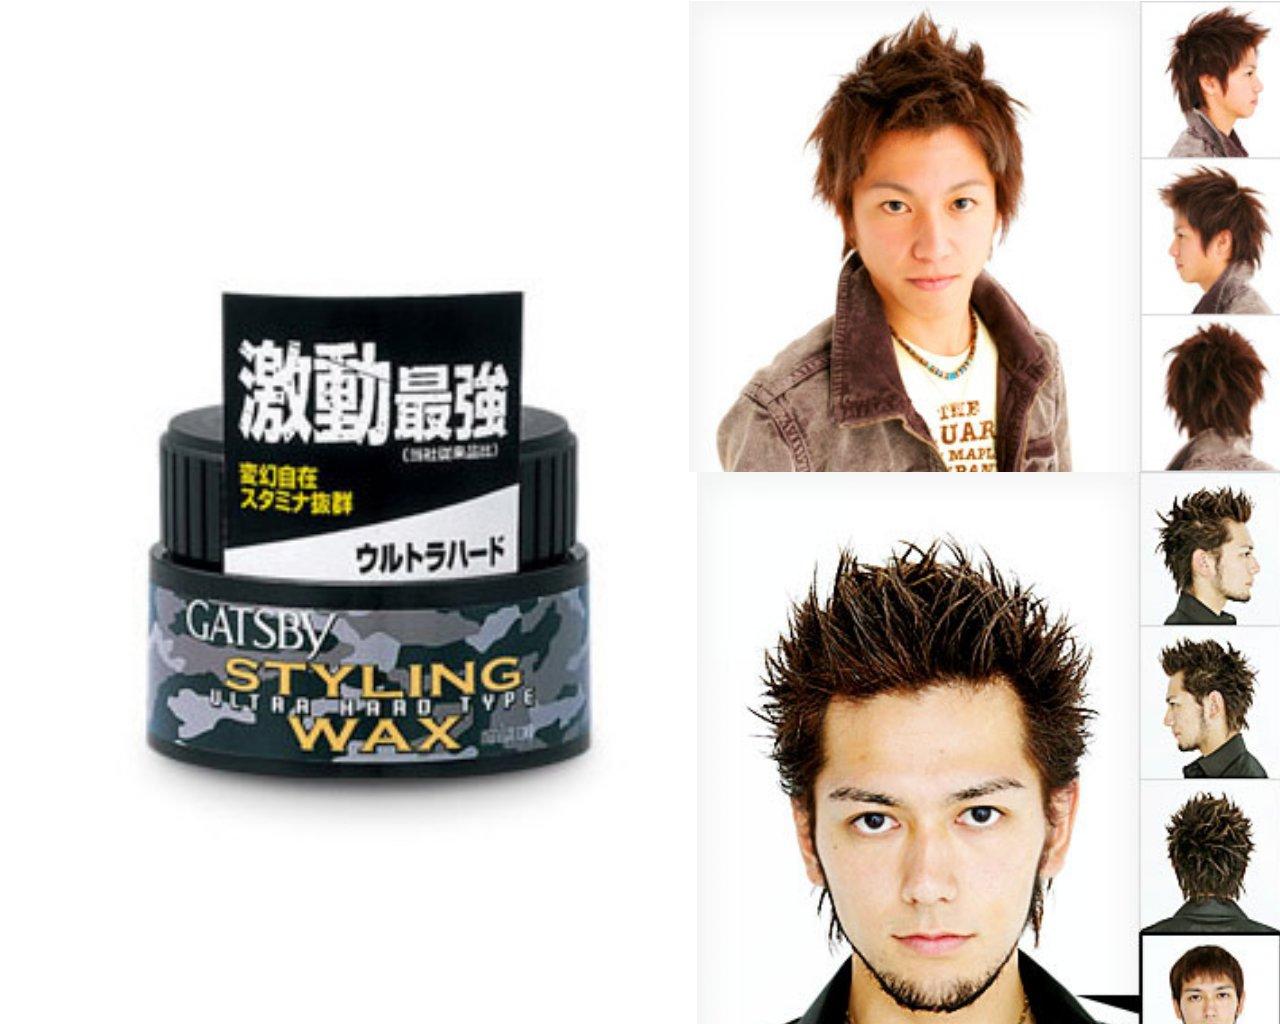 Japan Gatsby Hair Styling Strongest Series - Ultra Hard Type Wax 80g